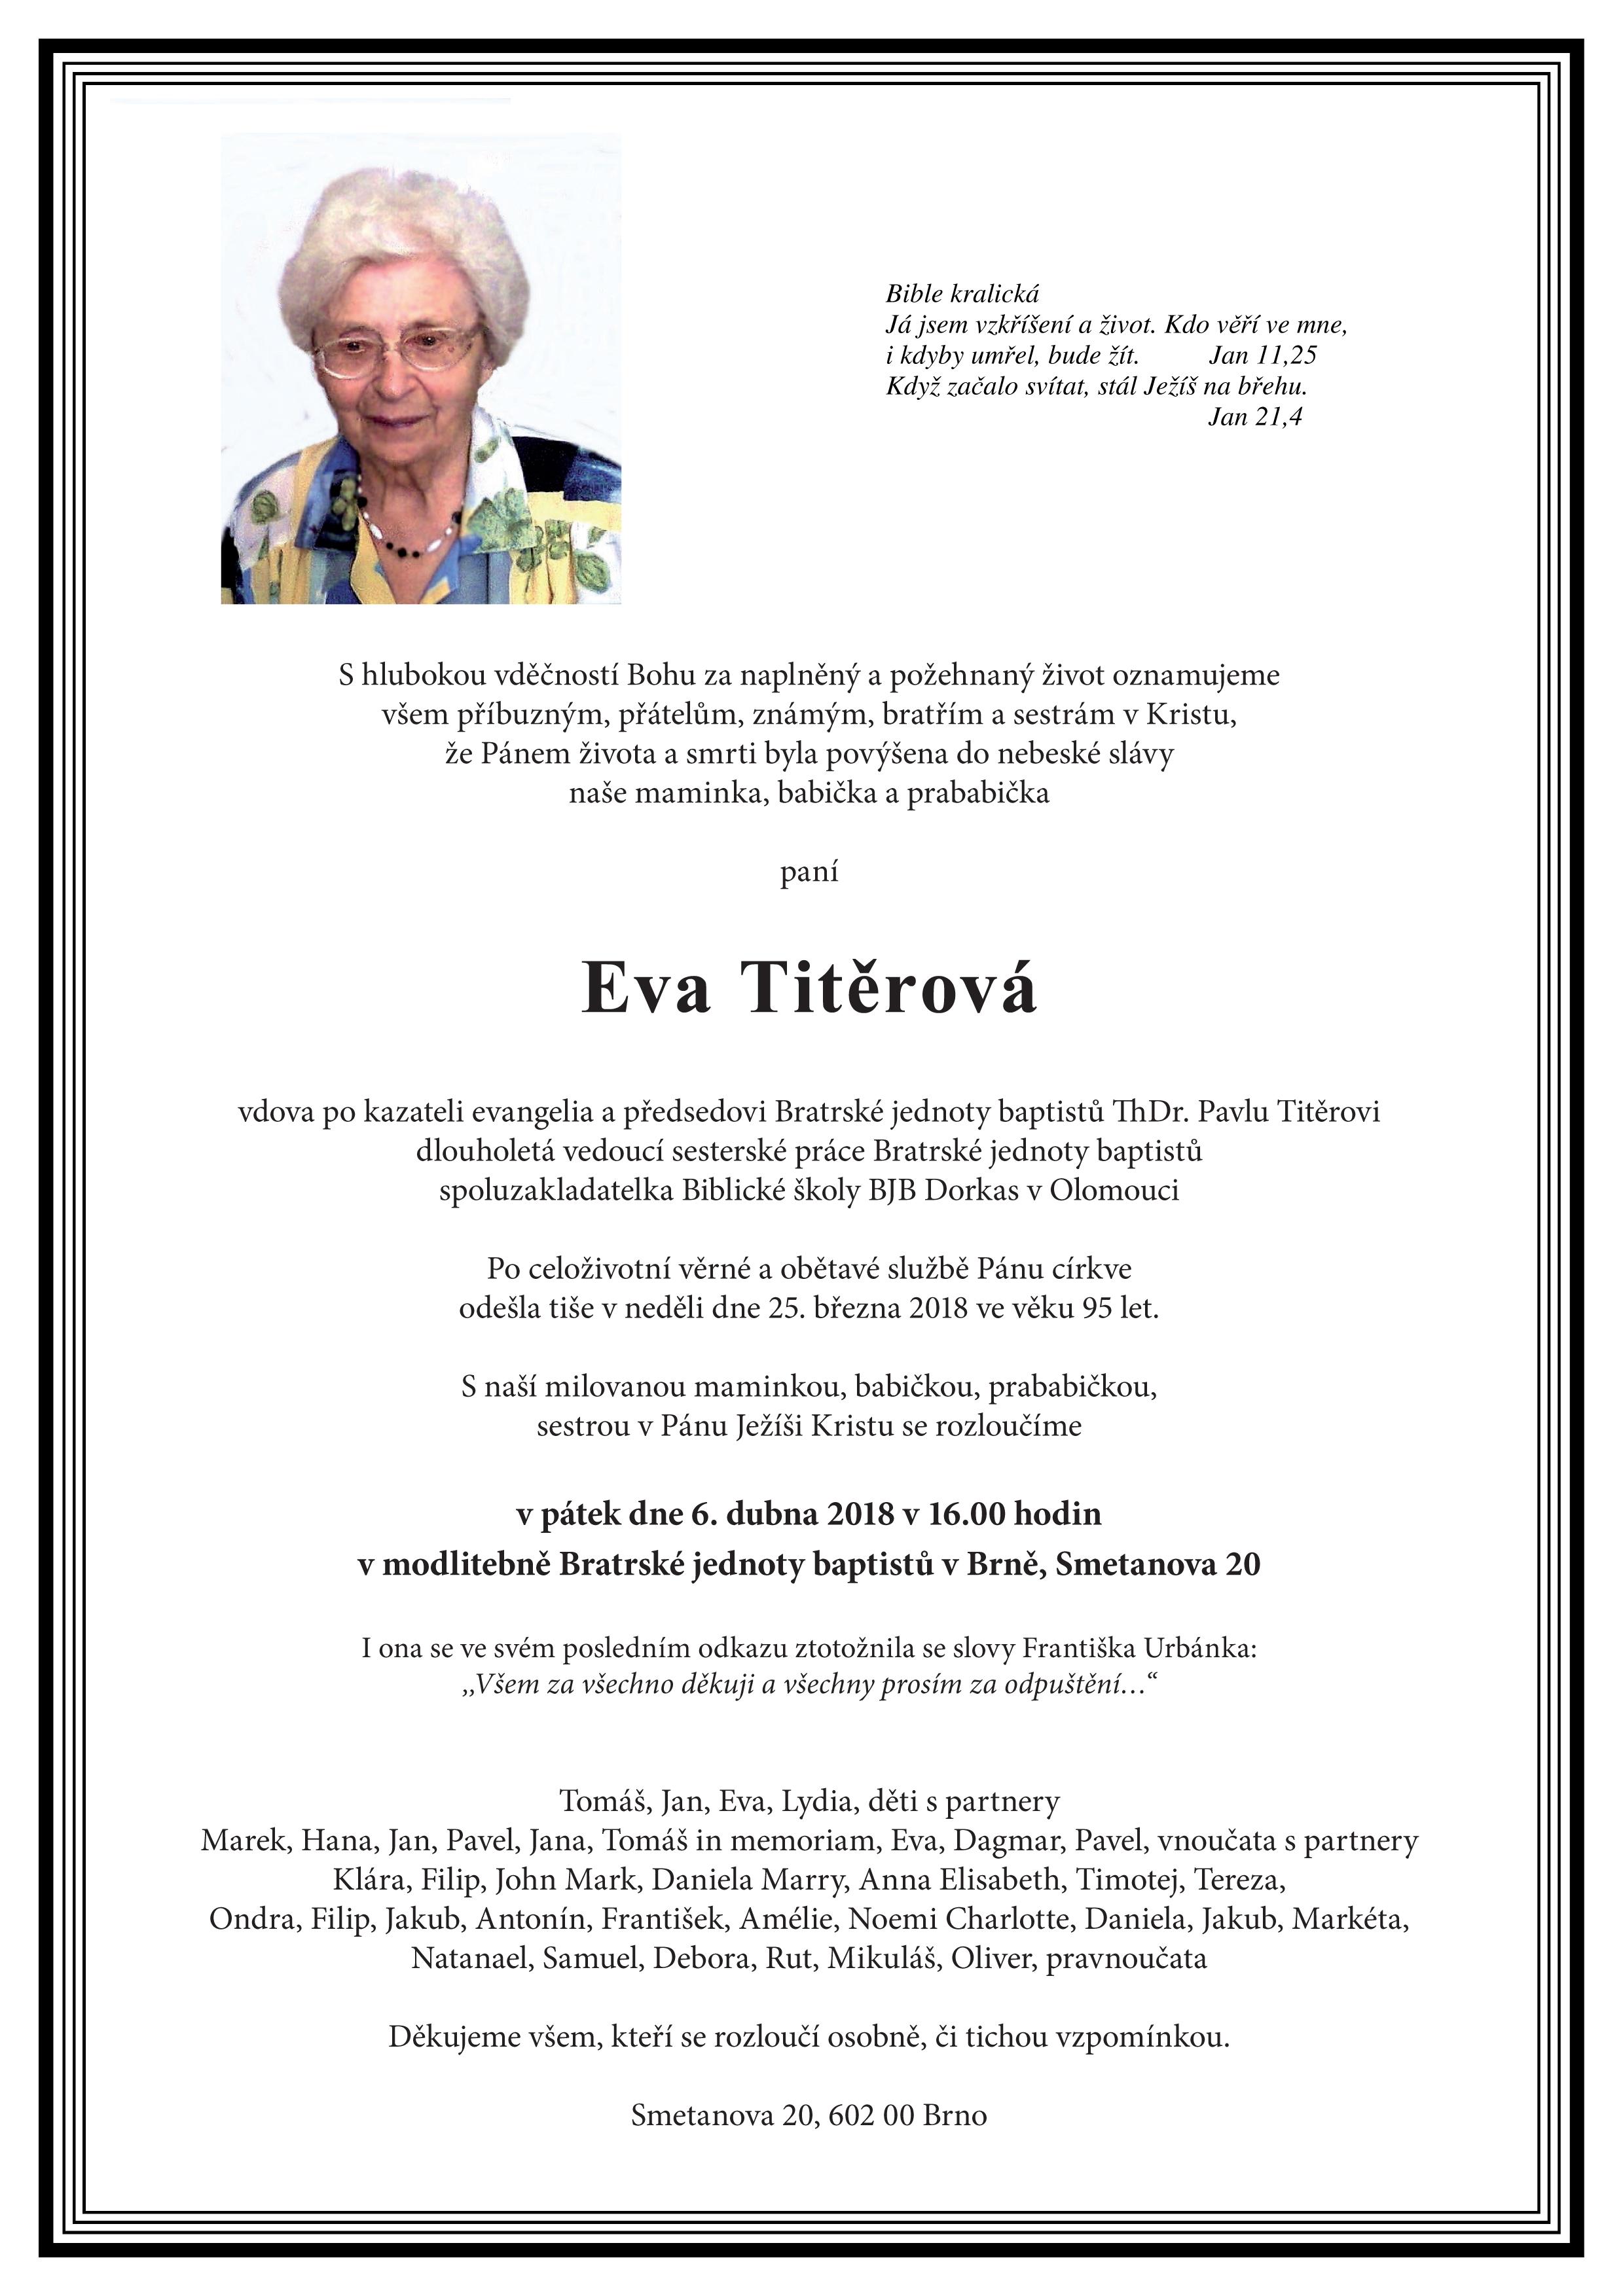 https://store.bjb.cz/parte_eva_titerova.jpg